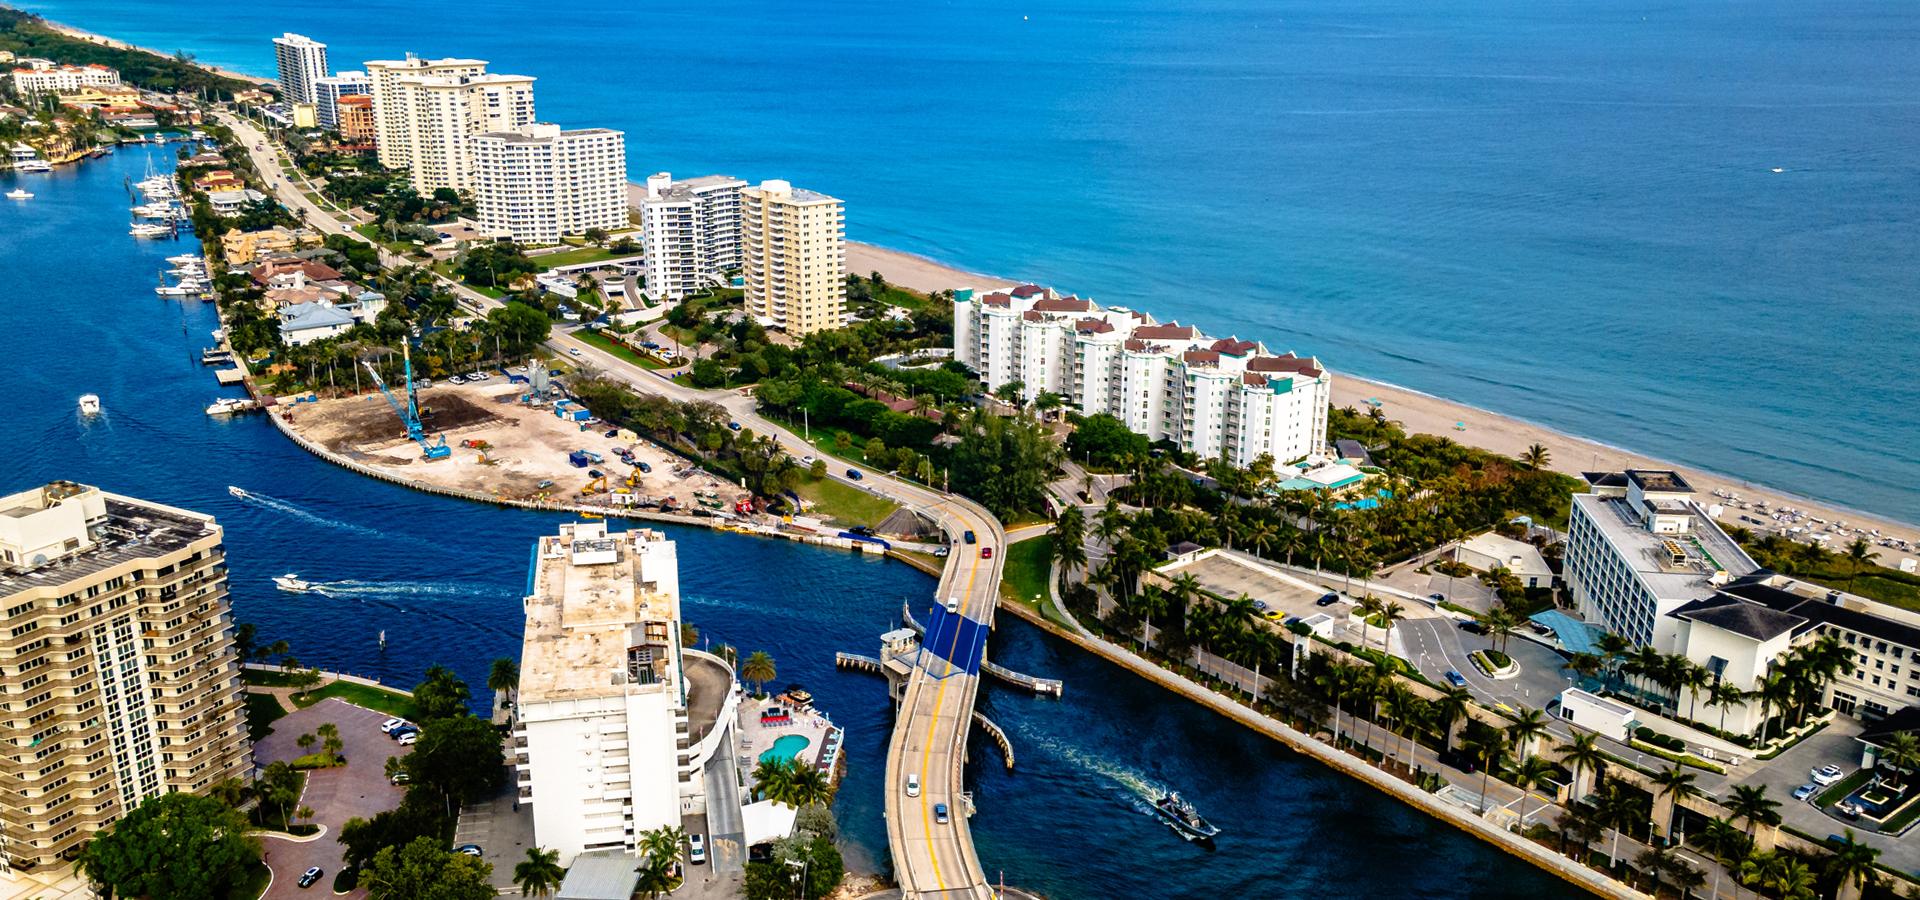 Peer-to-peer advisory in Boca Raton, Florida, USA